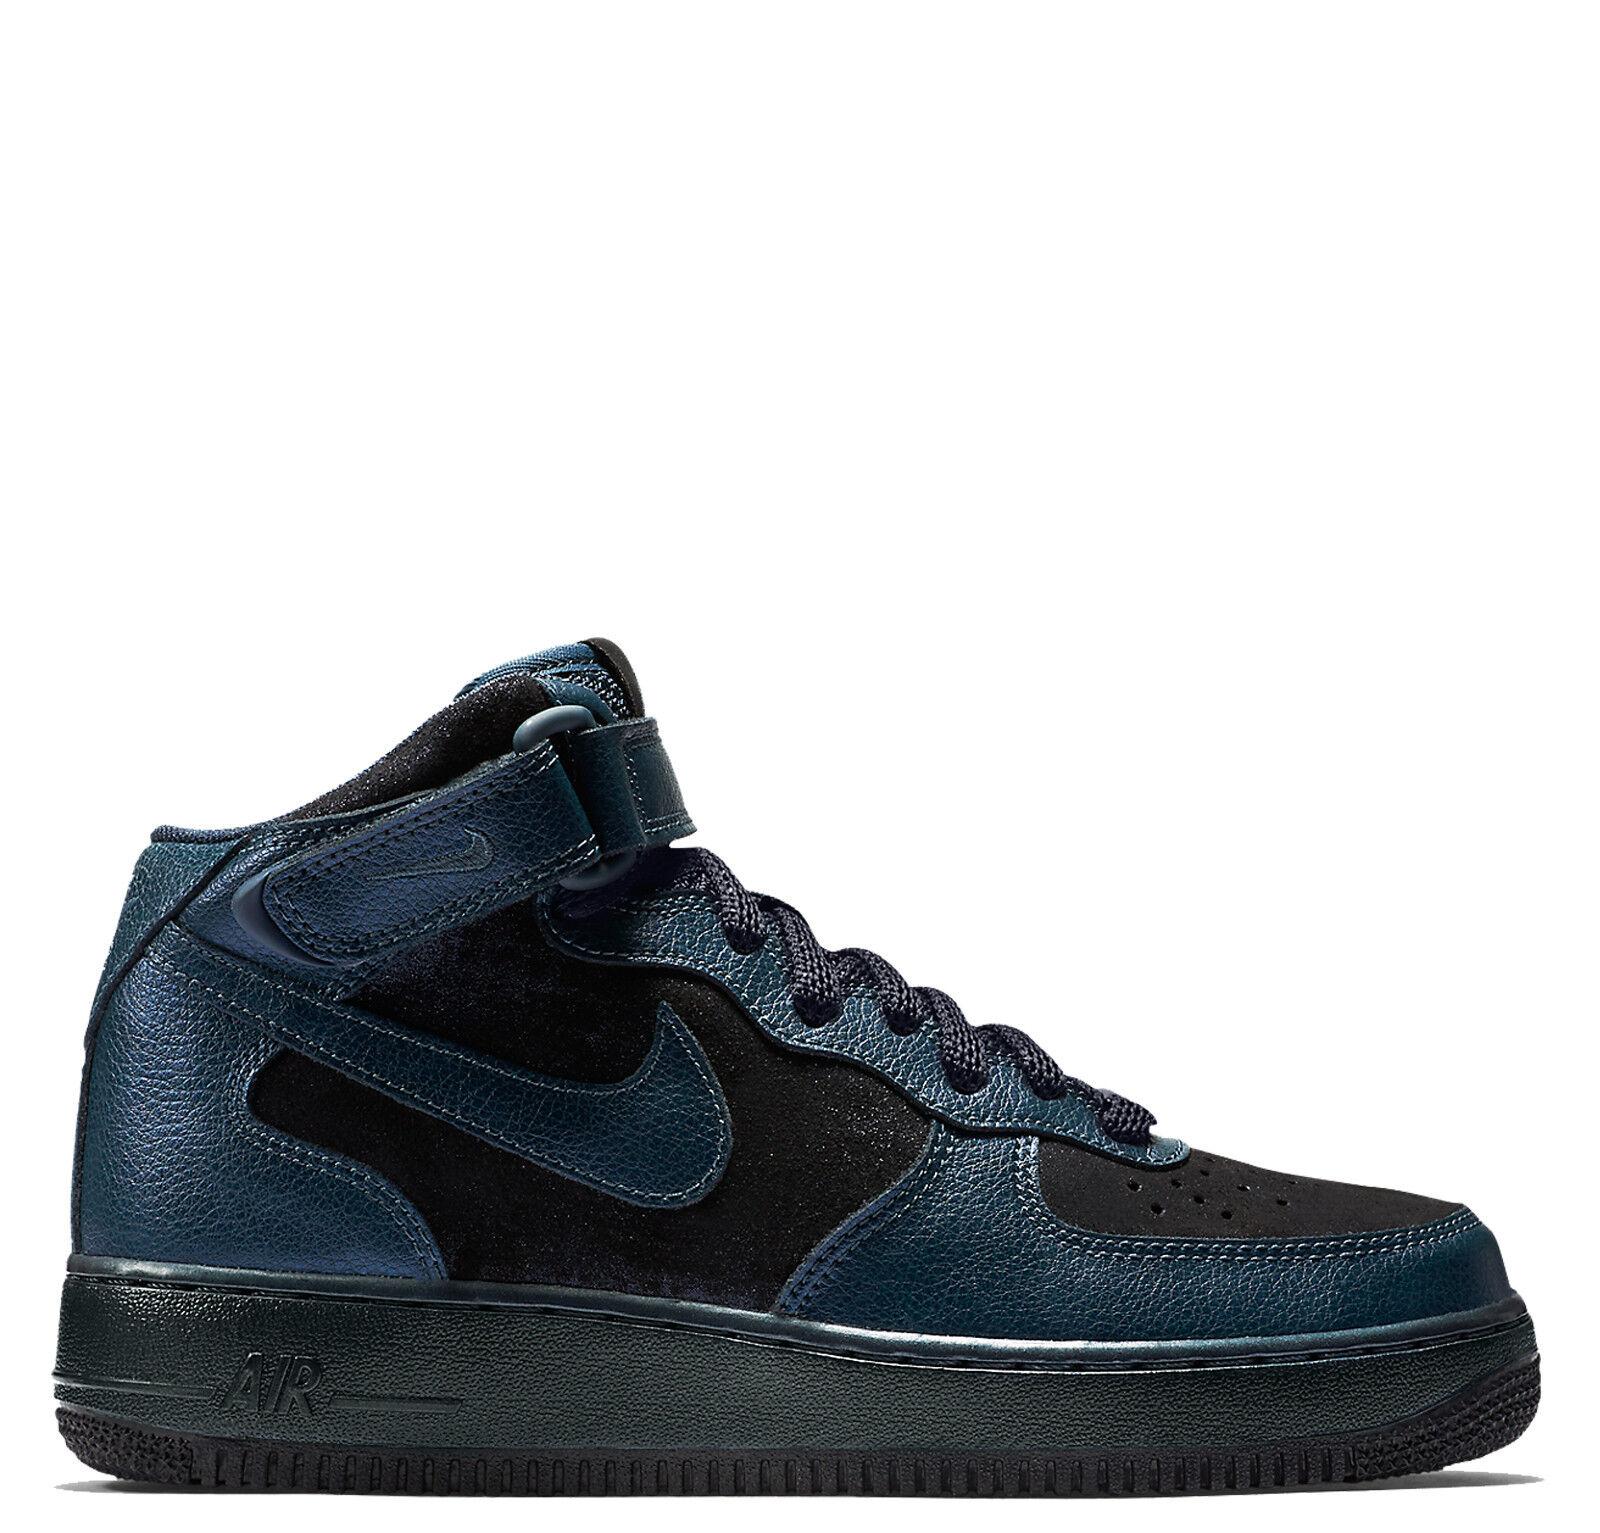 Women's Nike Air Force 1 '07 Mid PRM Women's Shoes